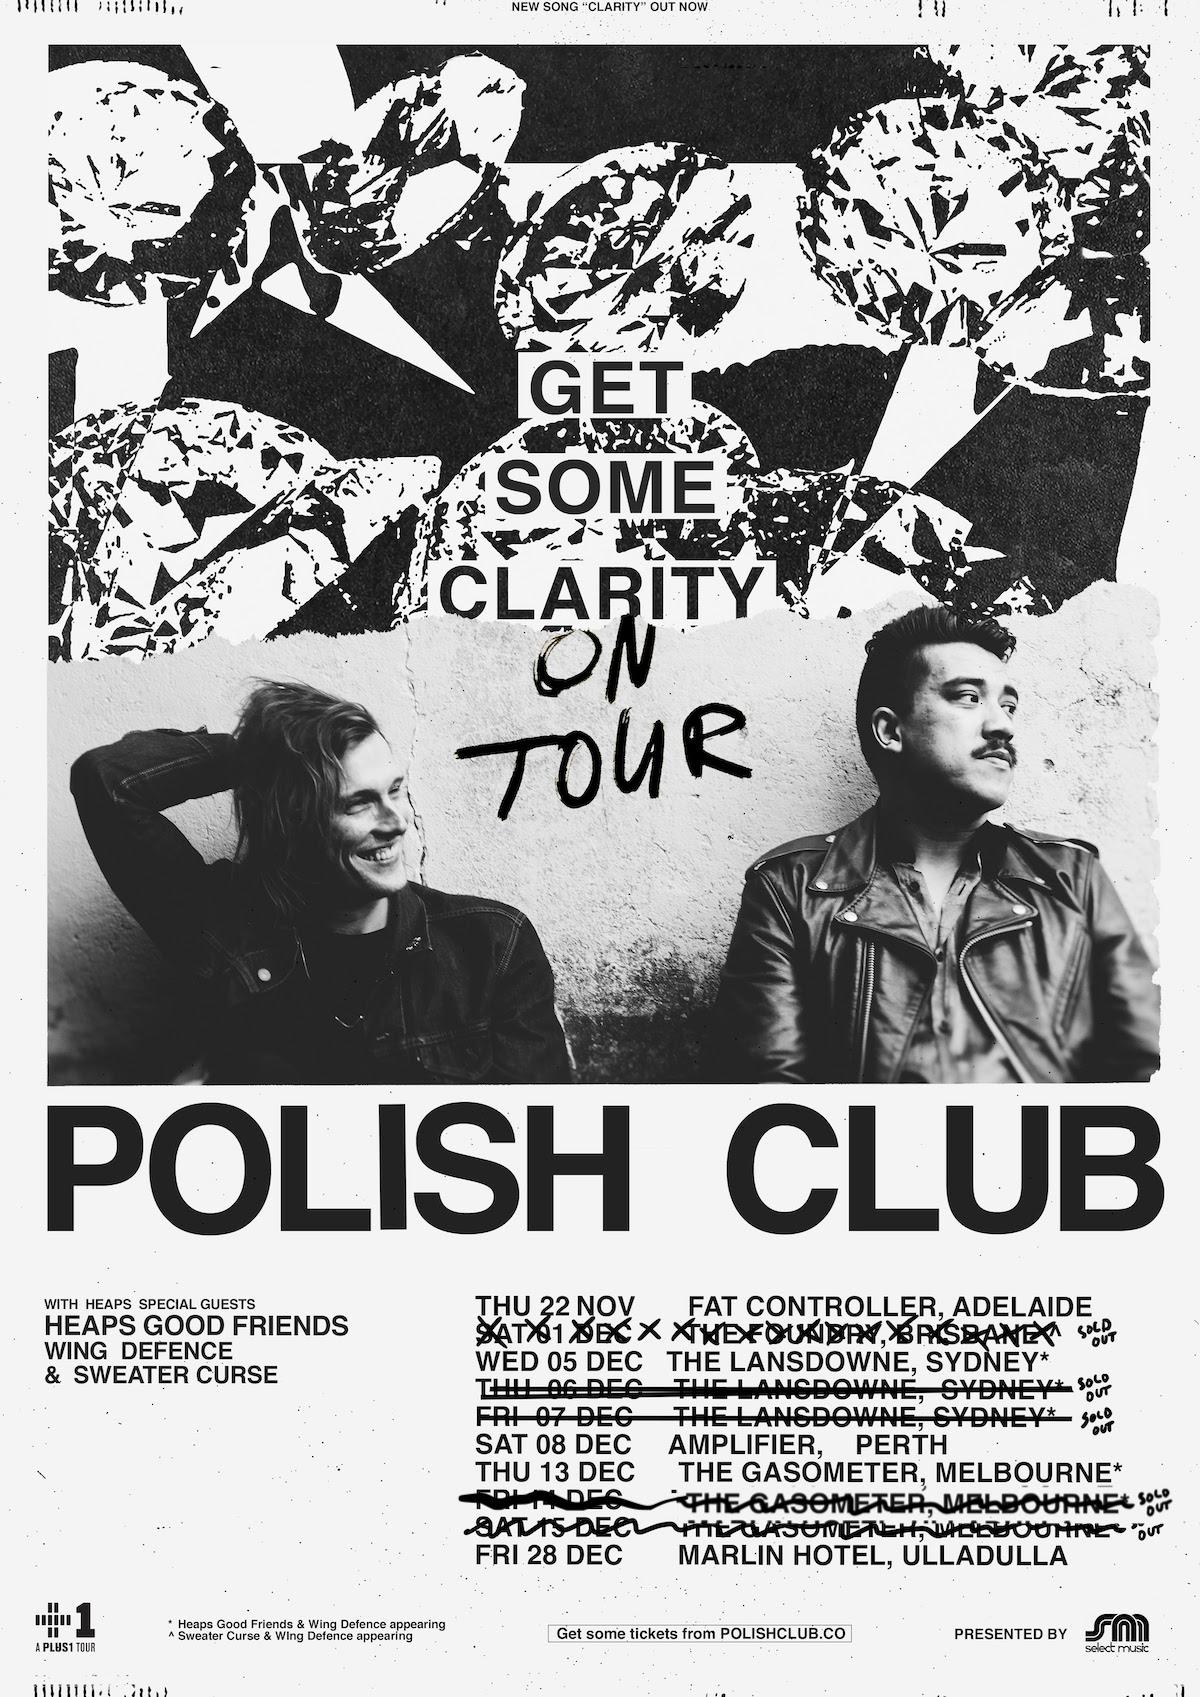 Polish Club (Aus) - Australia